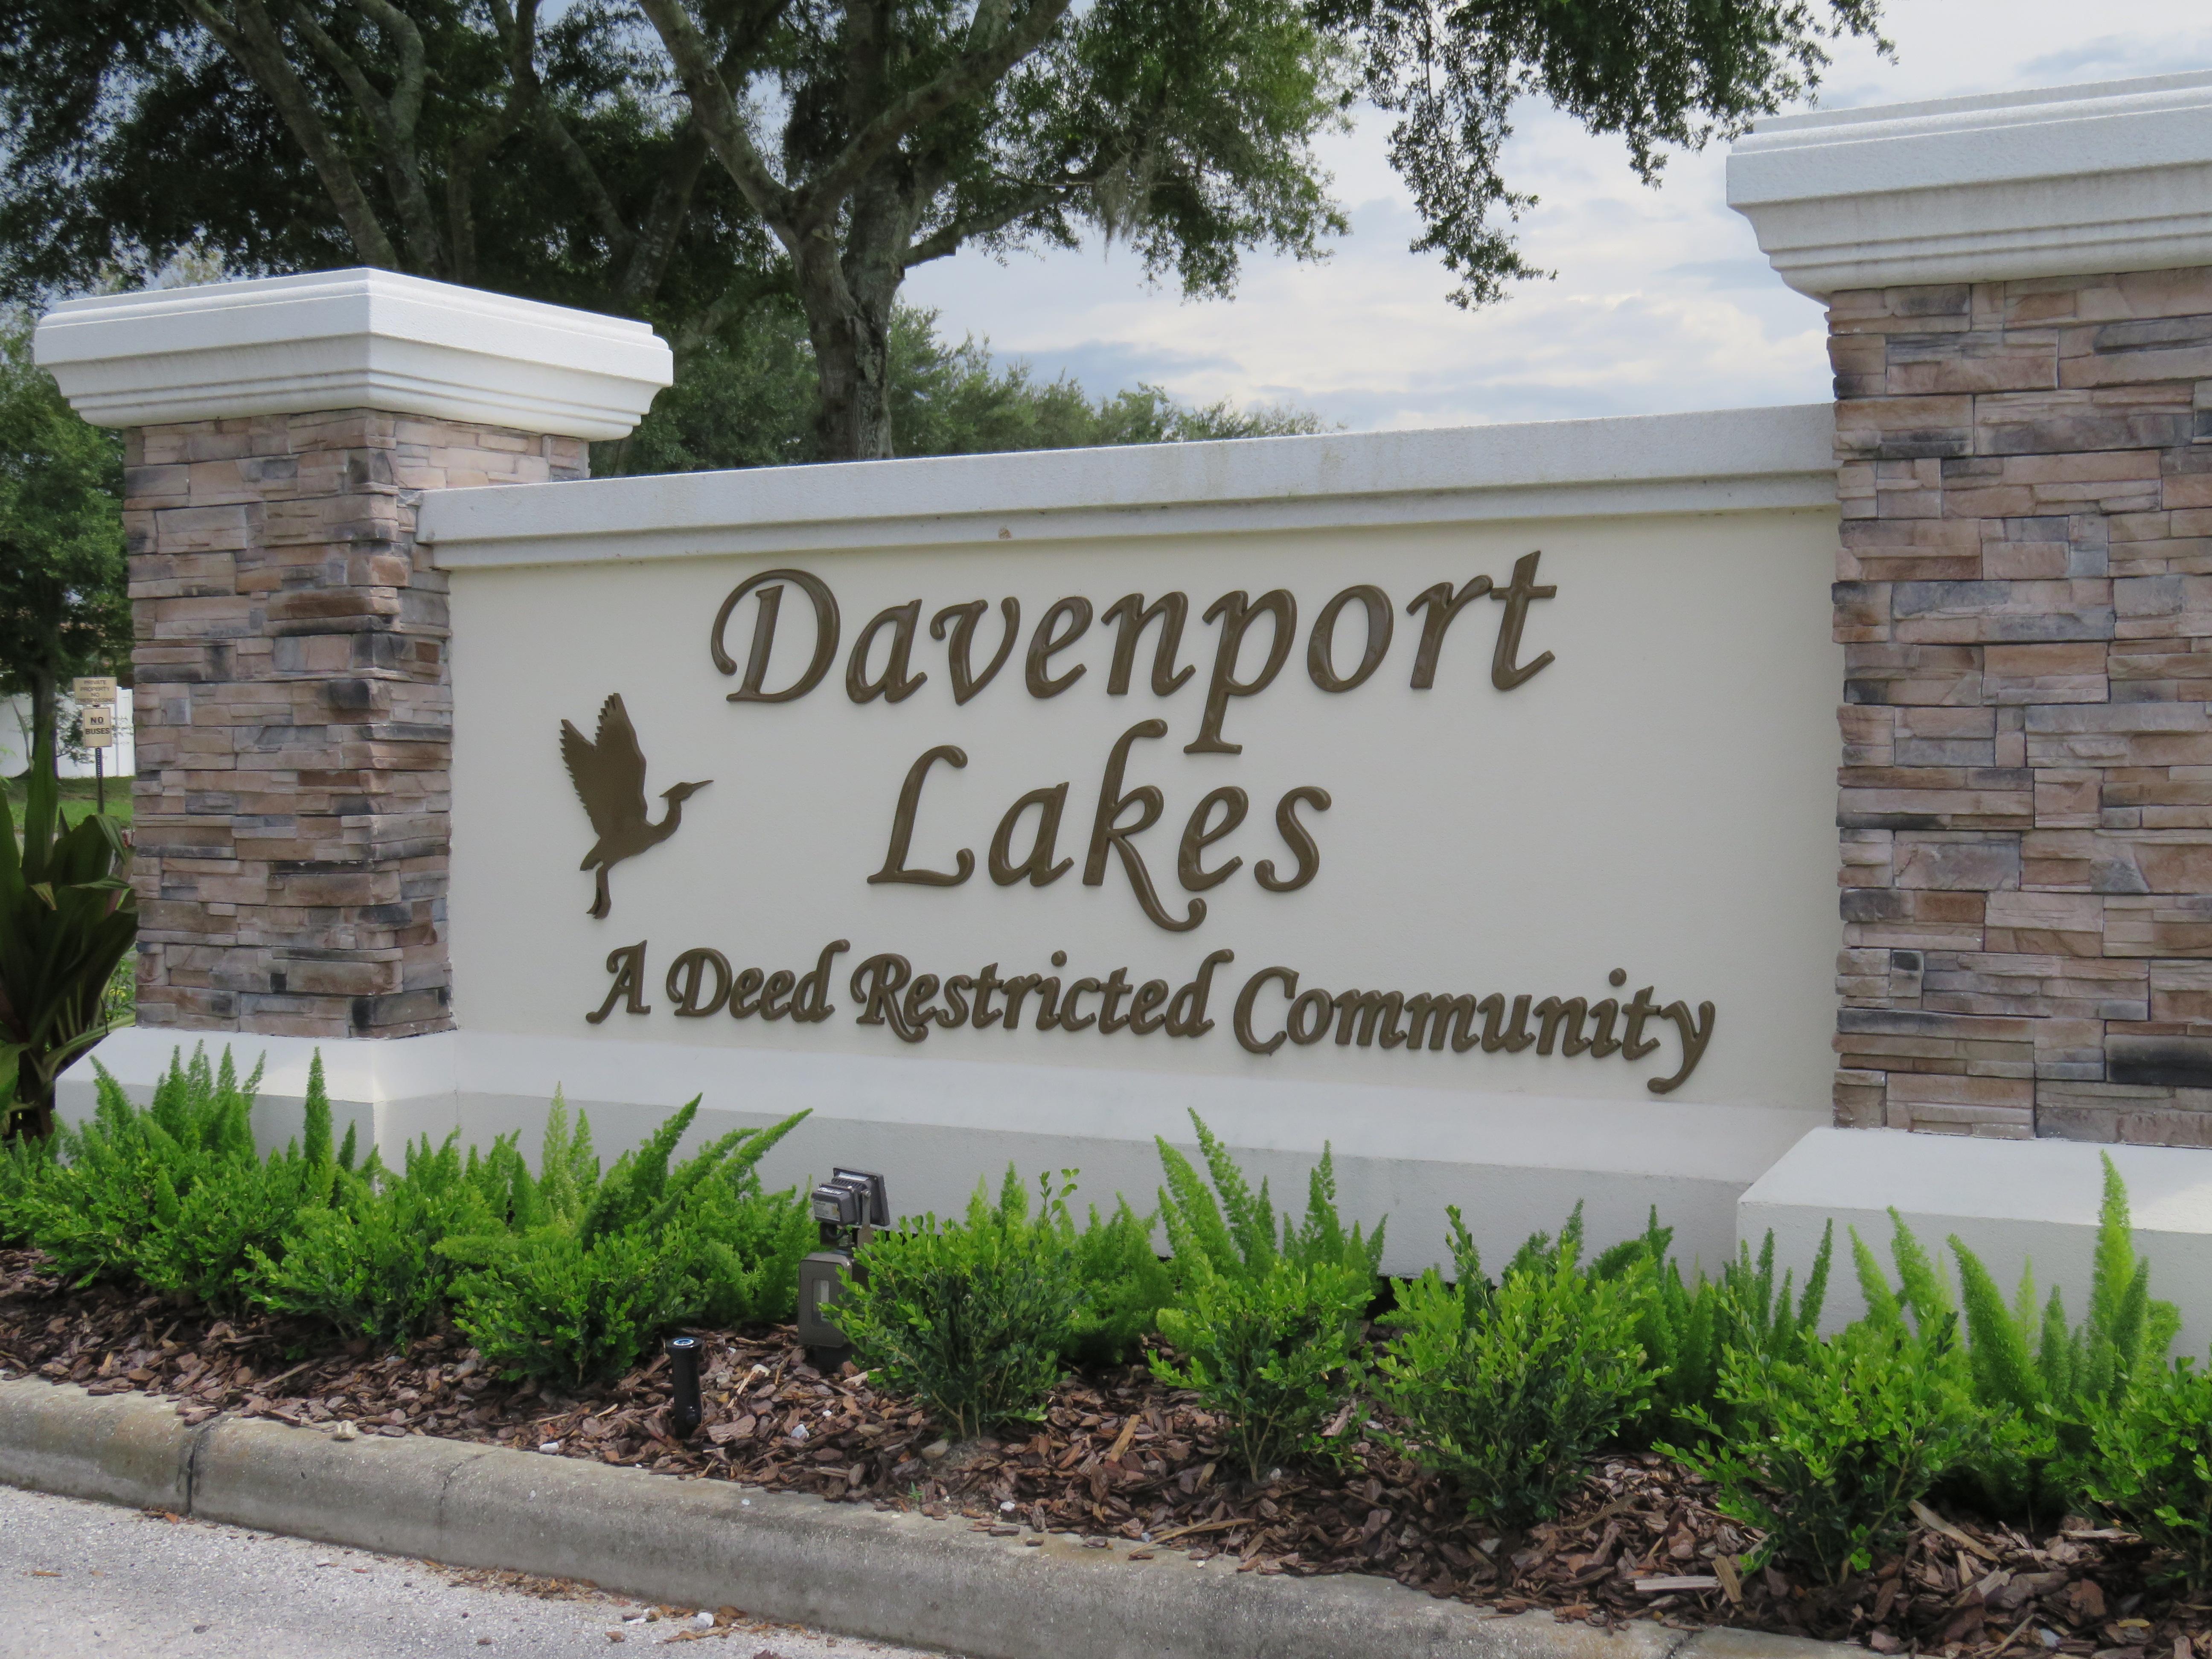 Davenport Lakes Community Entrance